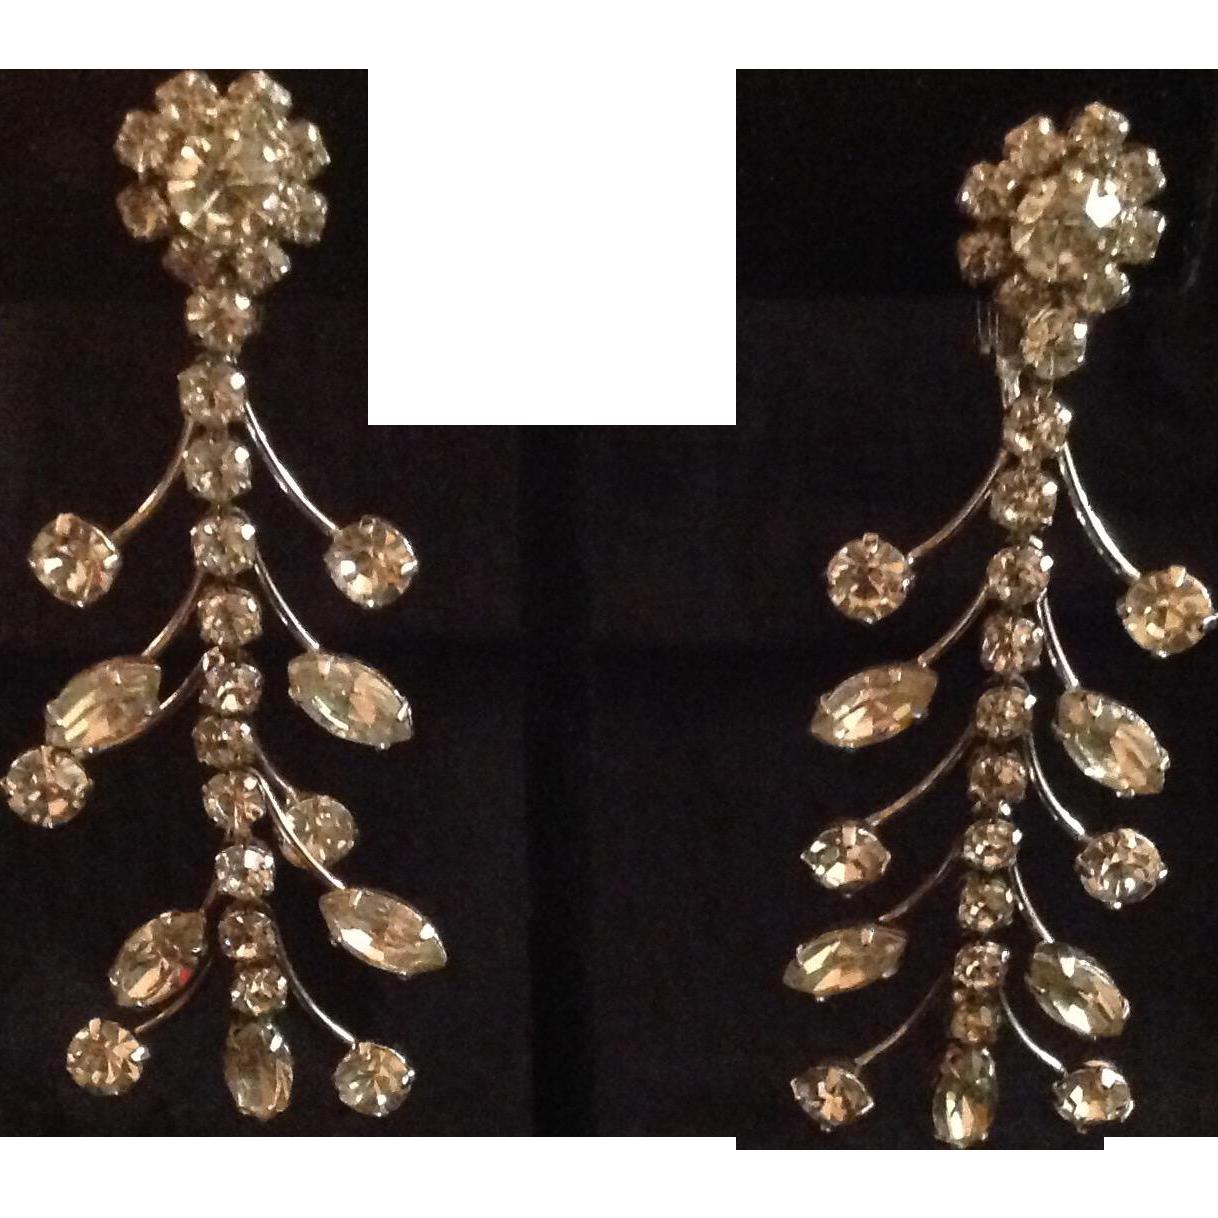 Prong-set Rhinestone Drop Earrings